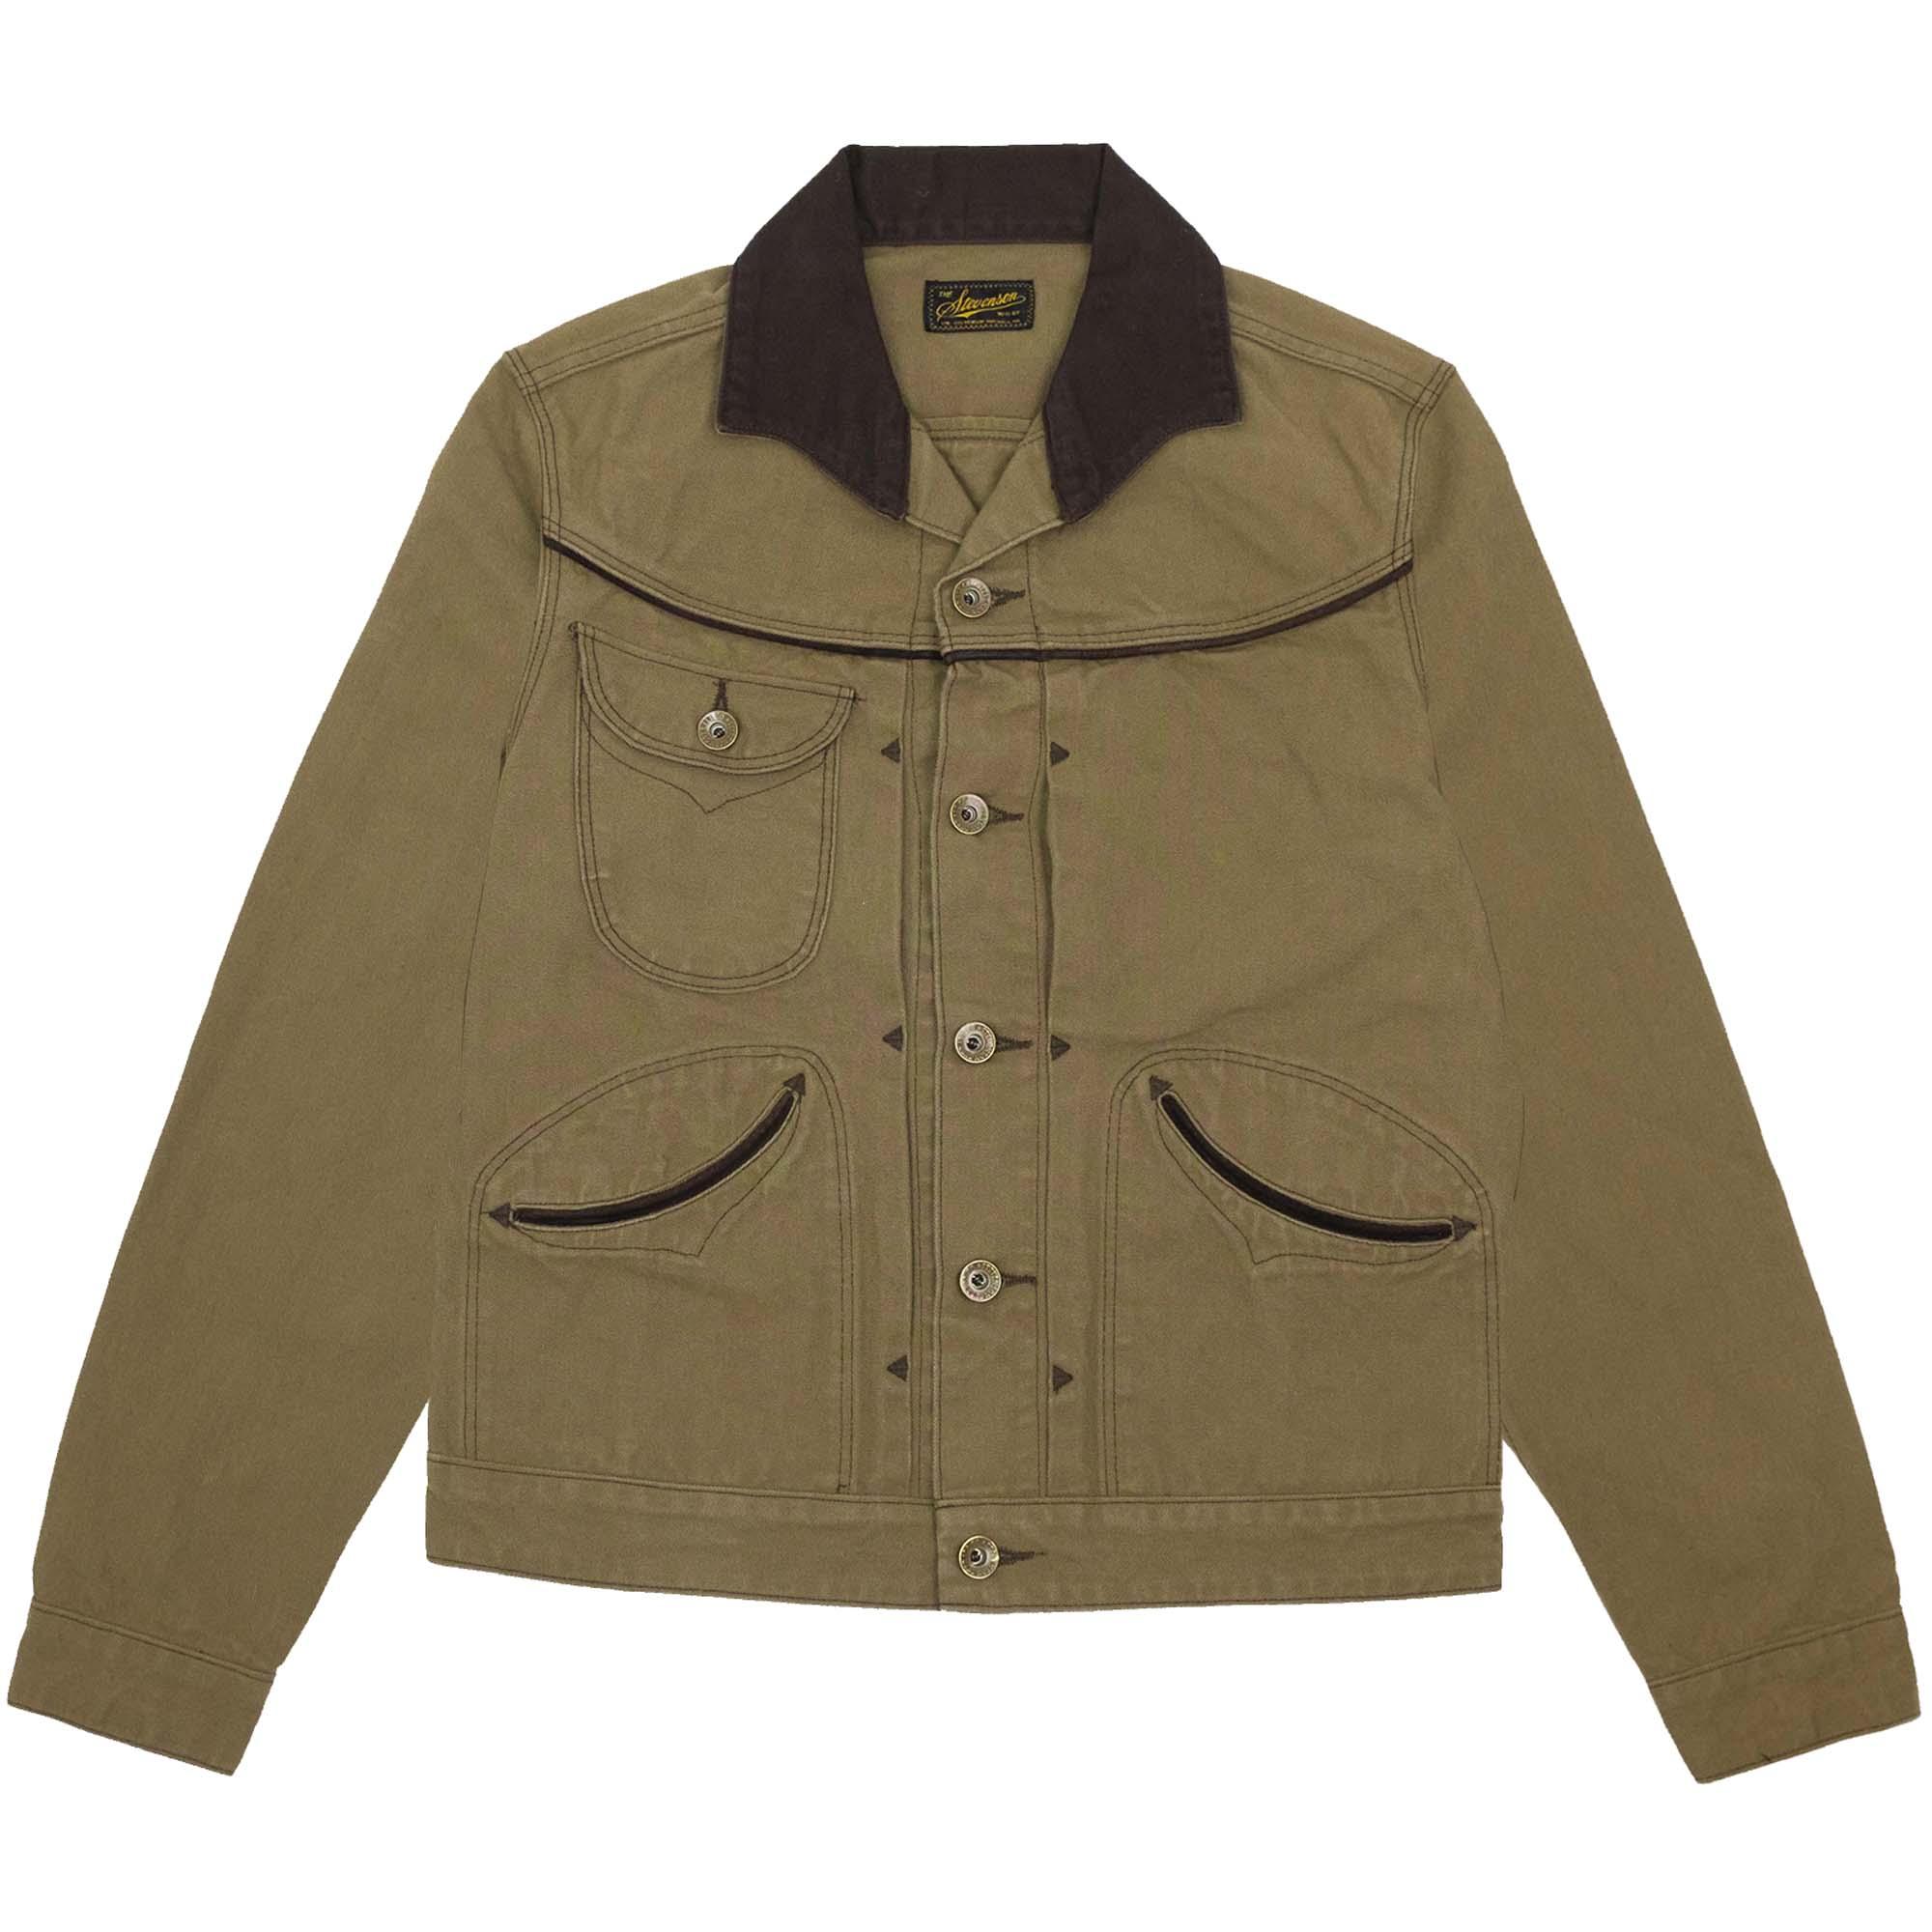 Stevenson Overall Co. Deputy Jacket - Khaki